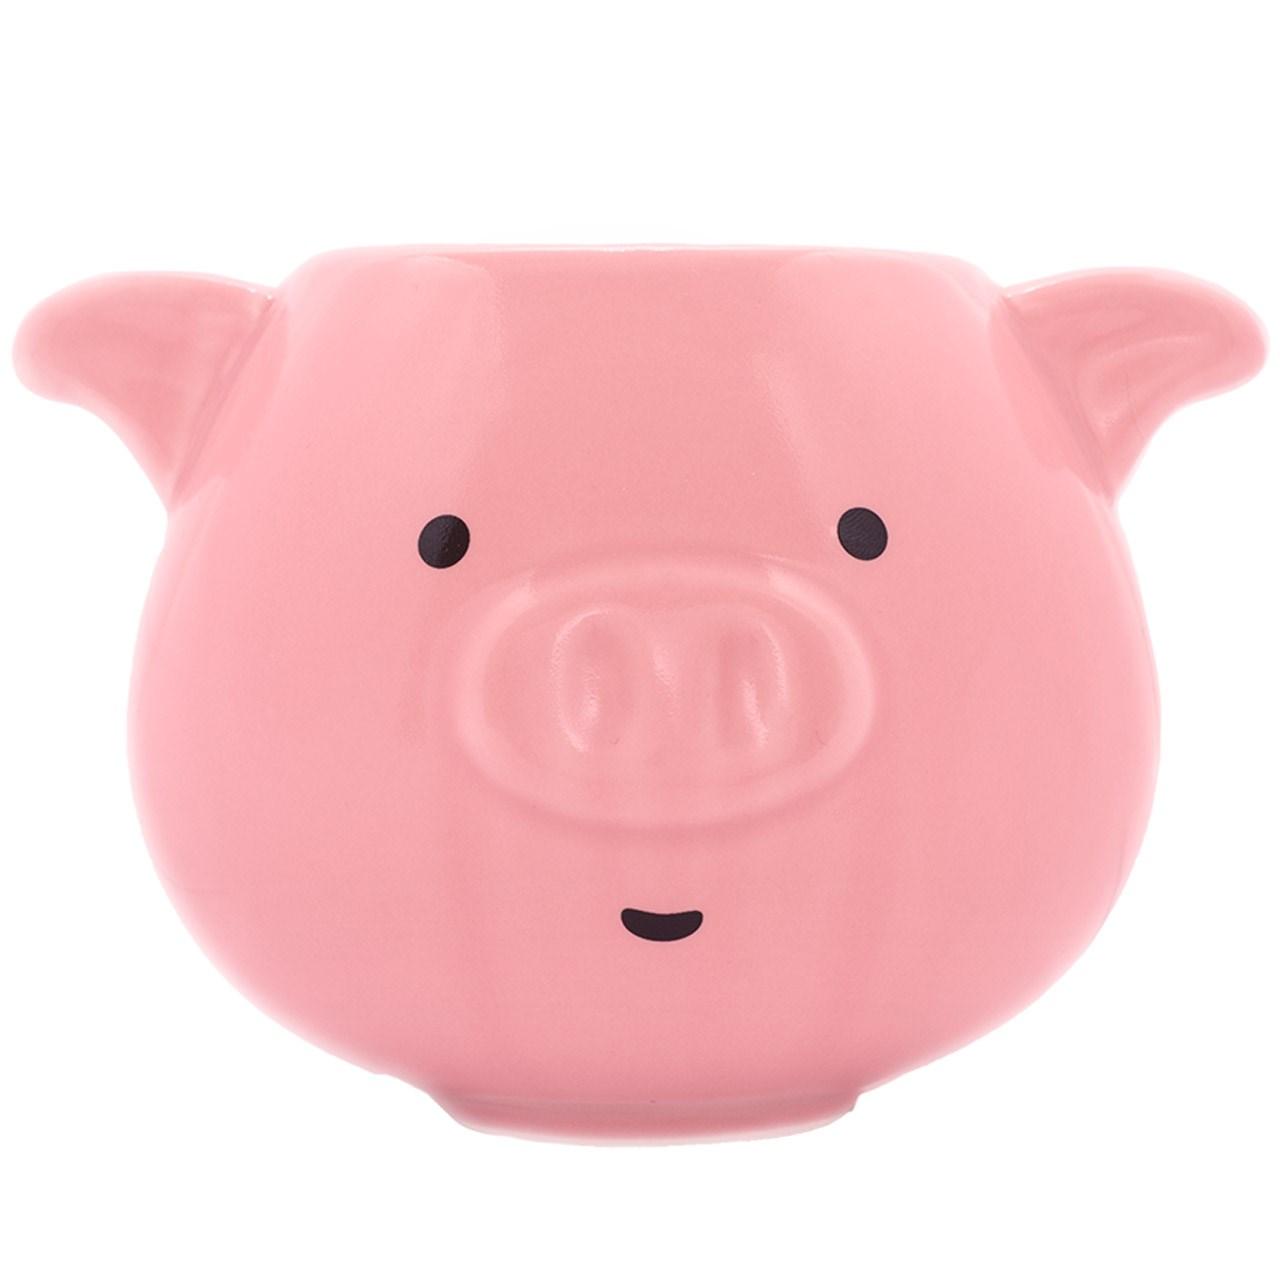 خرید ماگ تامبز آپ مدل Pig